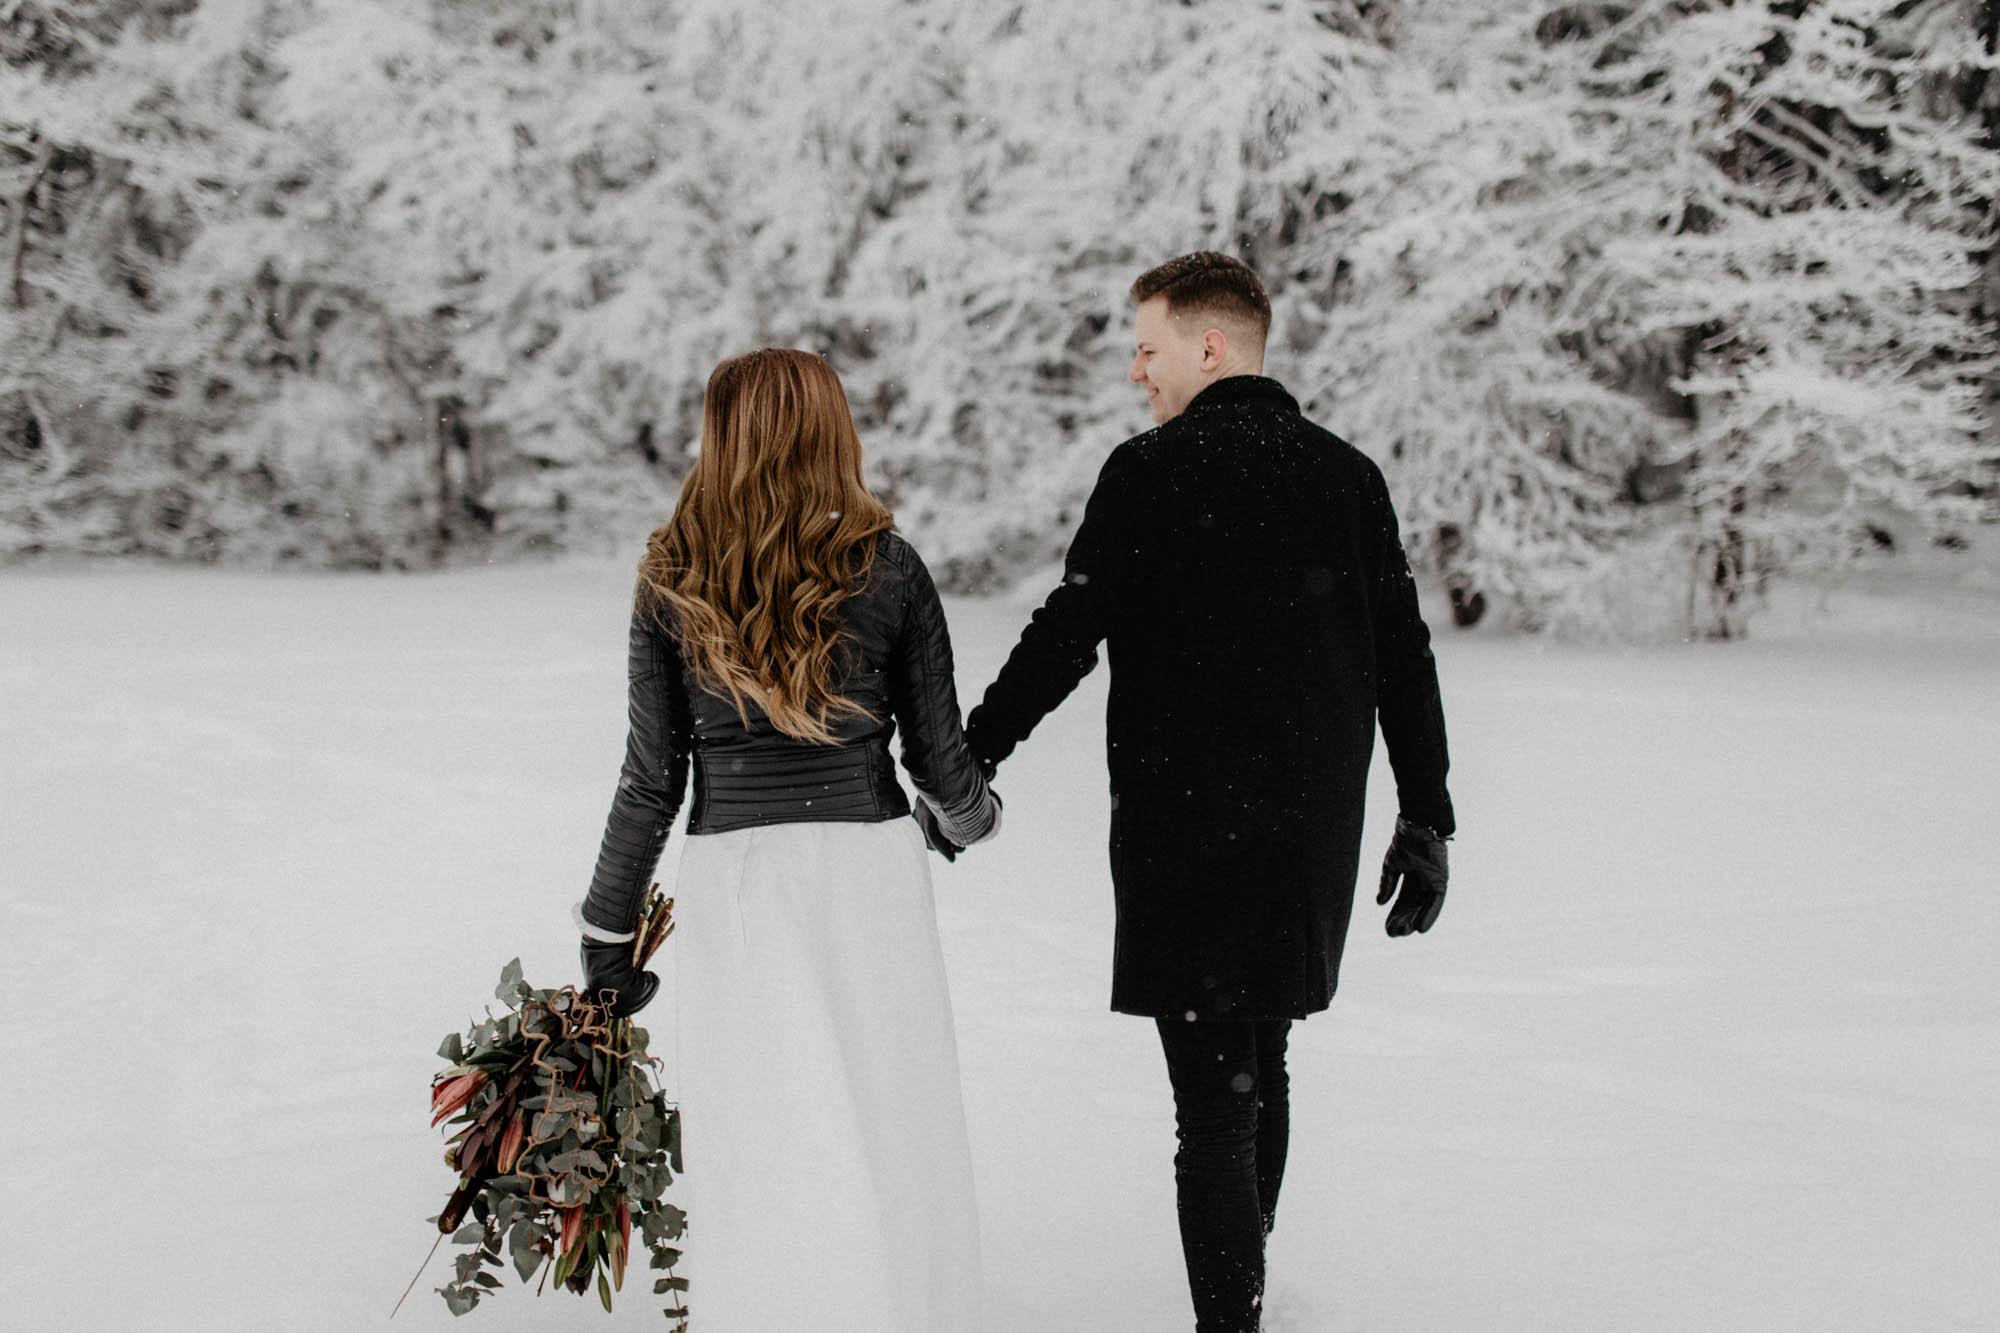 ashley_schulman_photography-winter_wedding_tampere-6.jpg